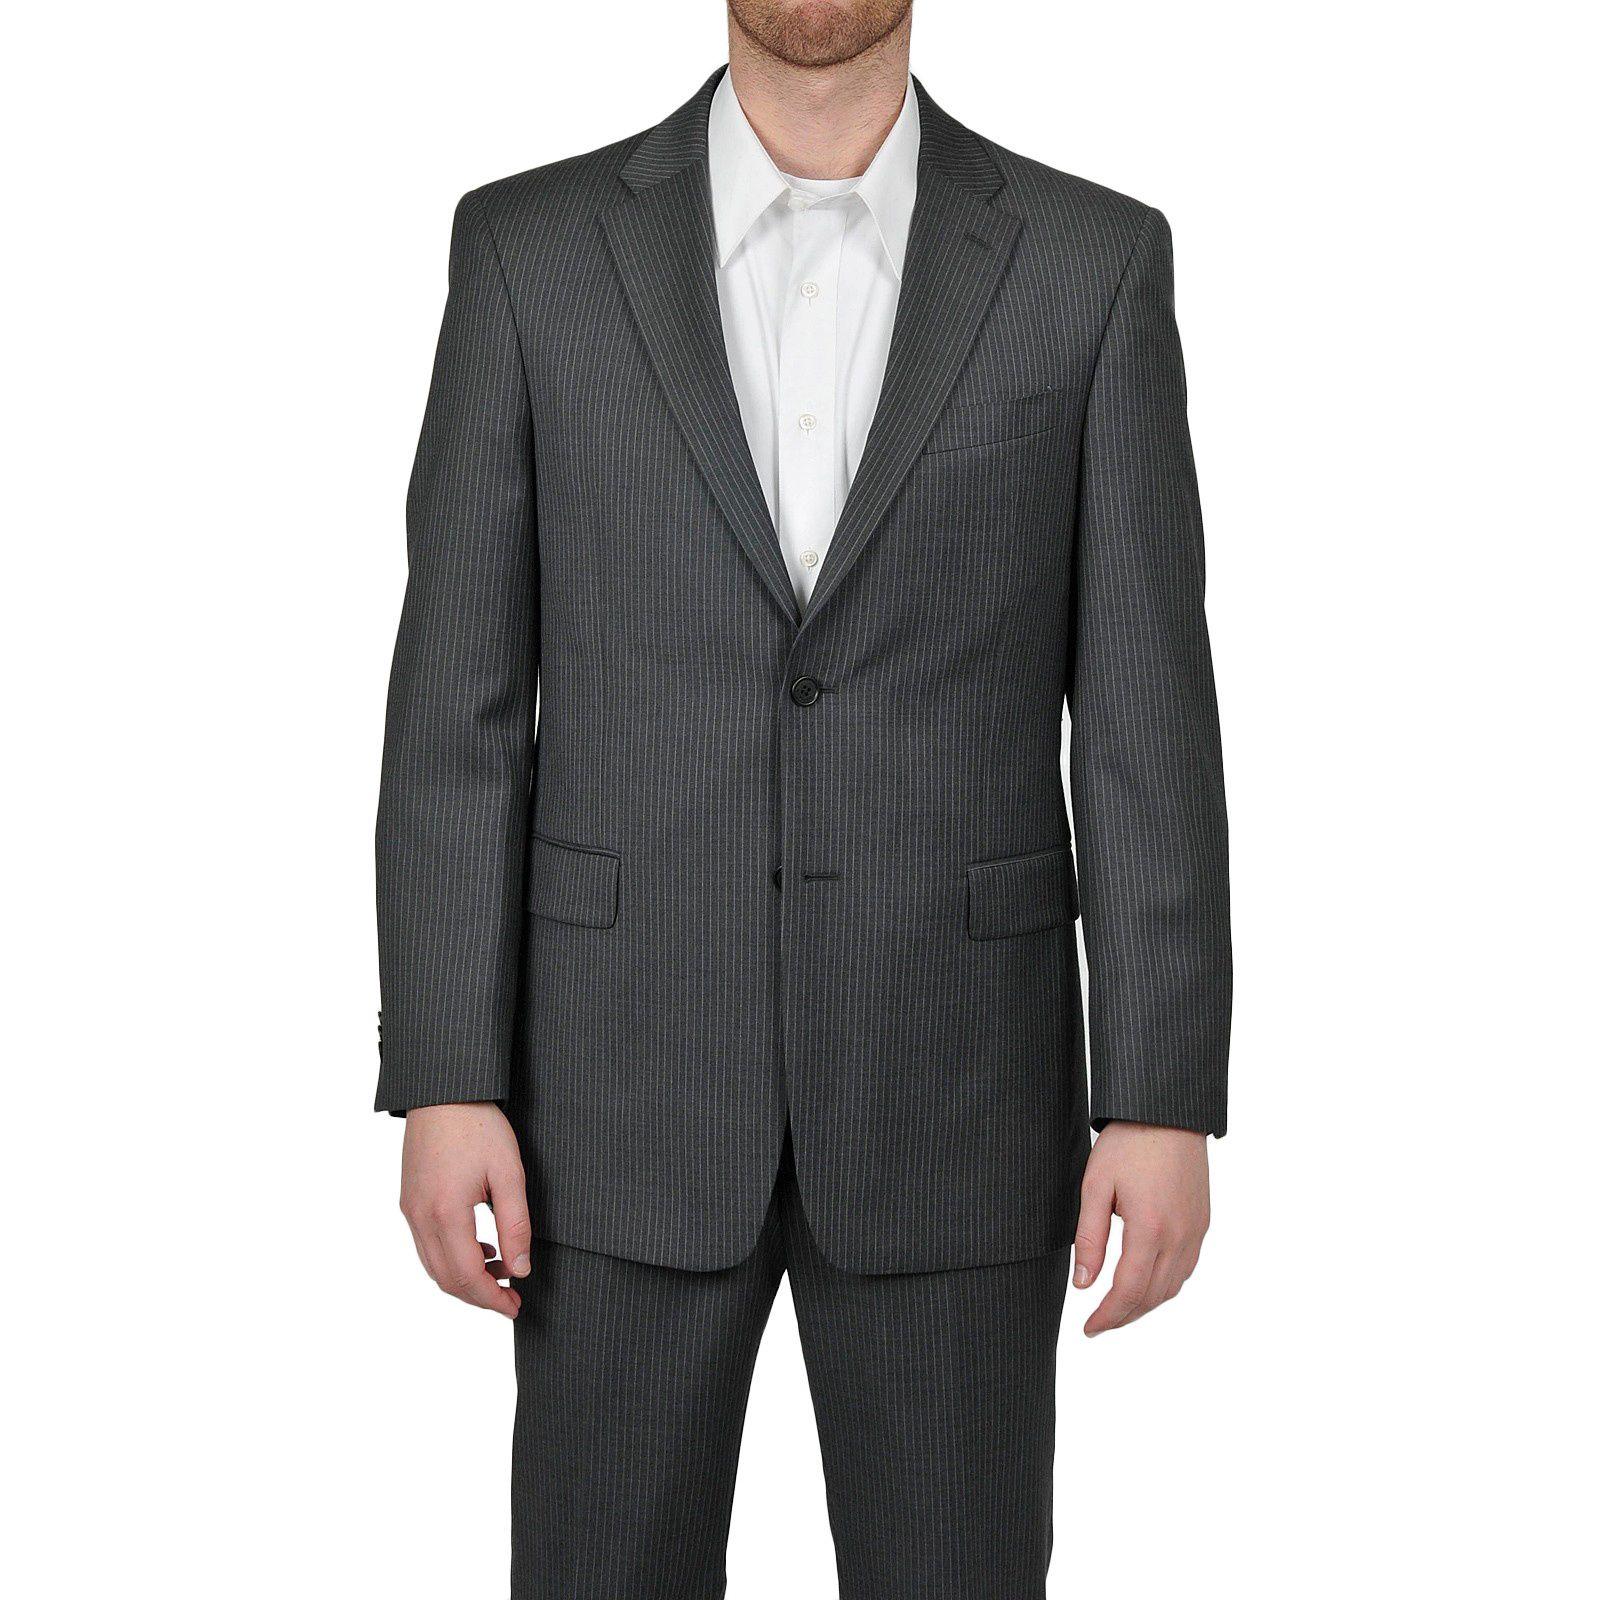 Tommy Hilfiger Men's Trim Fit Gray Slim Jacket (Gray-36R)